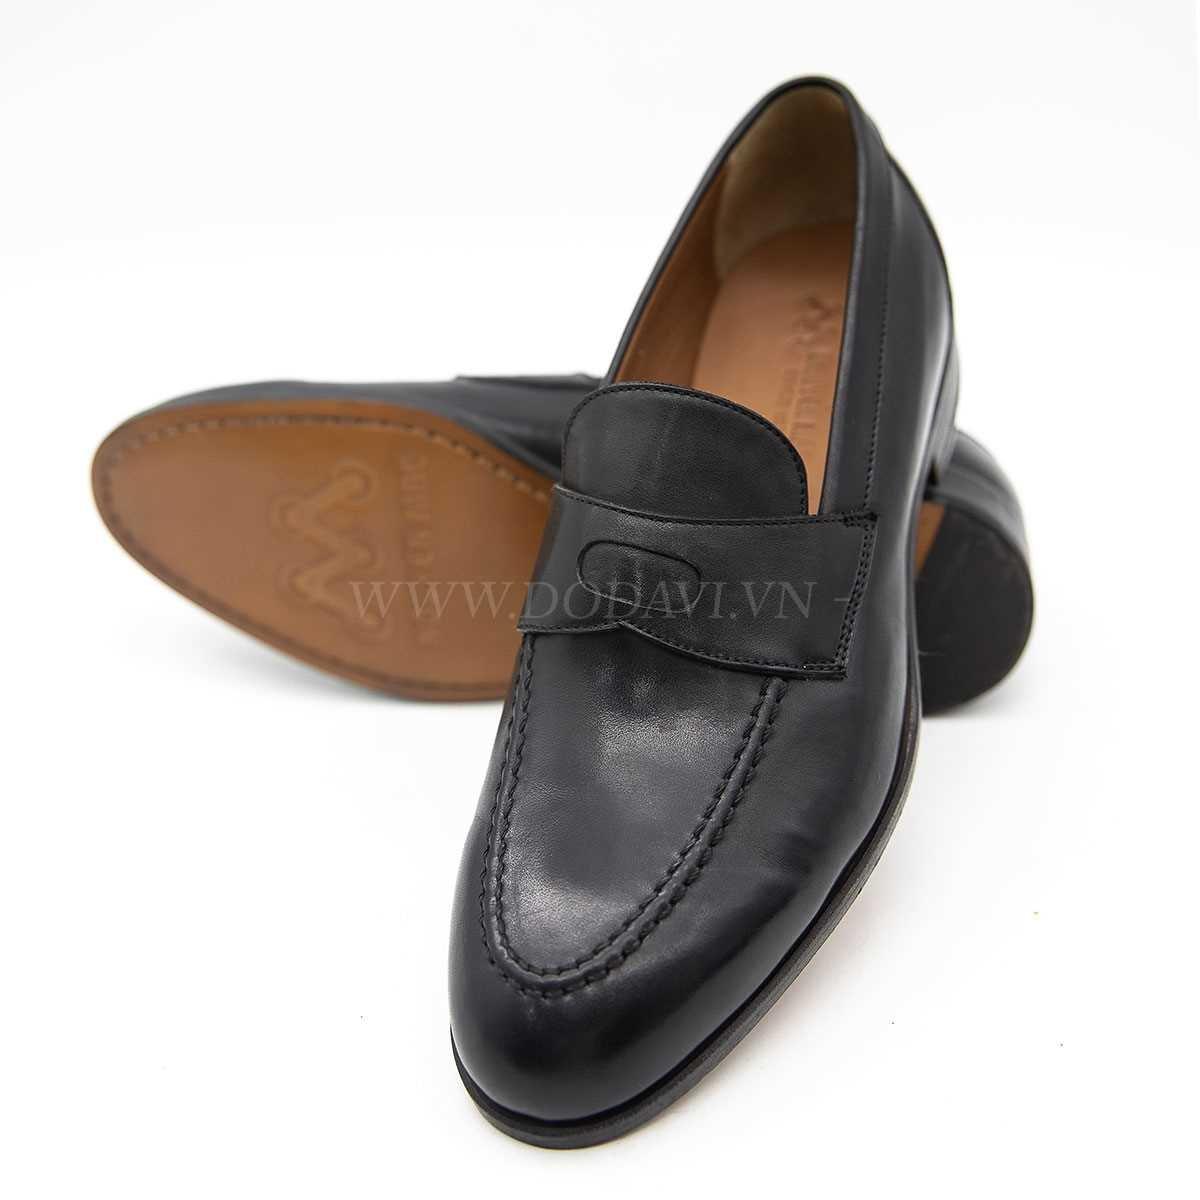 Giày đế da YS1110.40